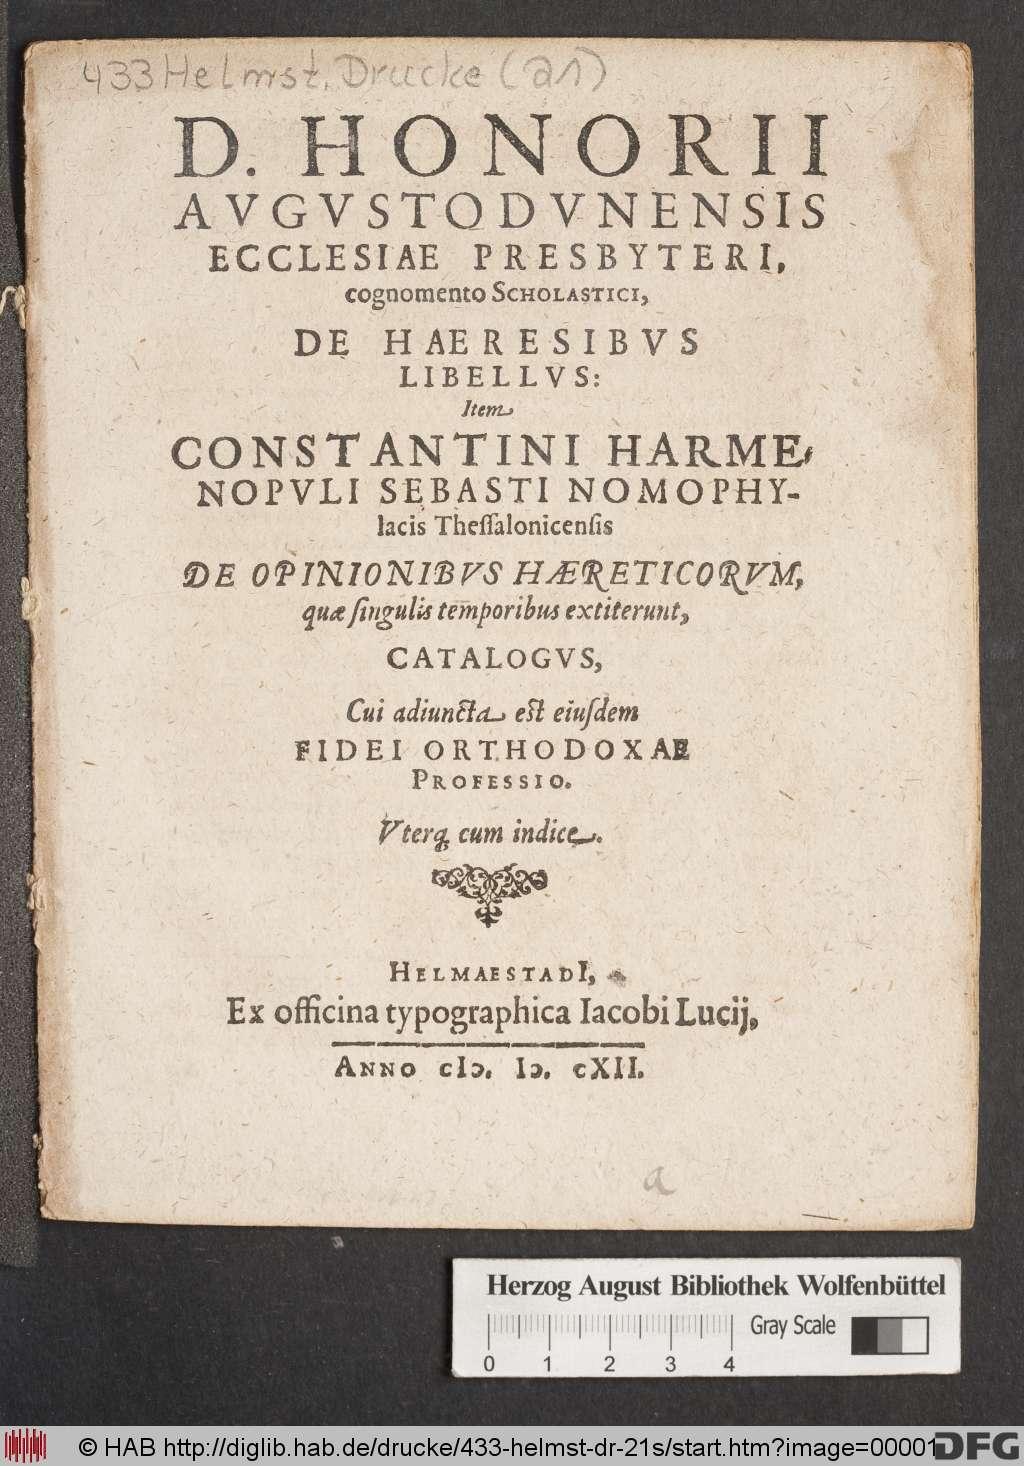 http://diglib.hab.de/drucke/433-helmst-dr-21s/00001.jpg